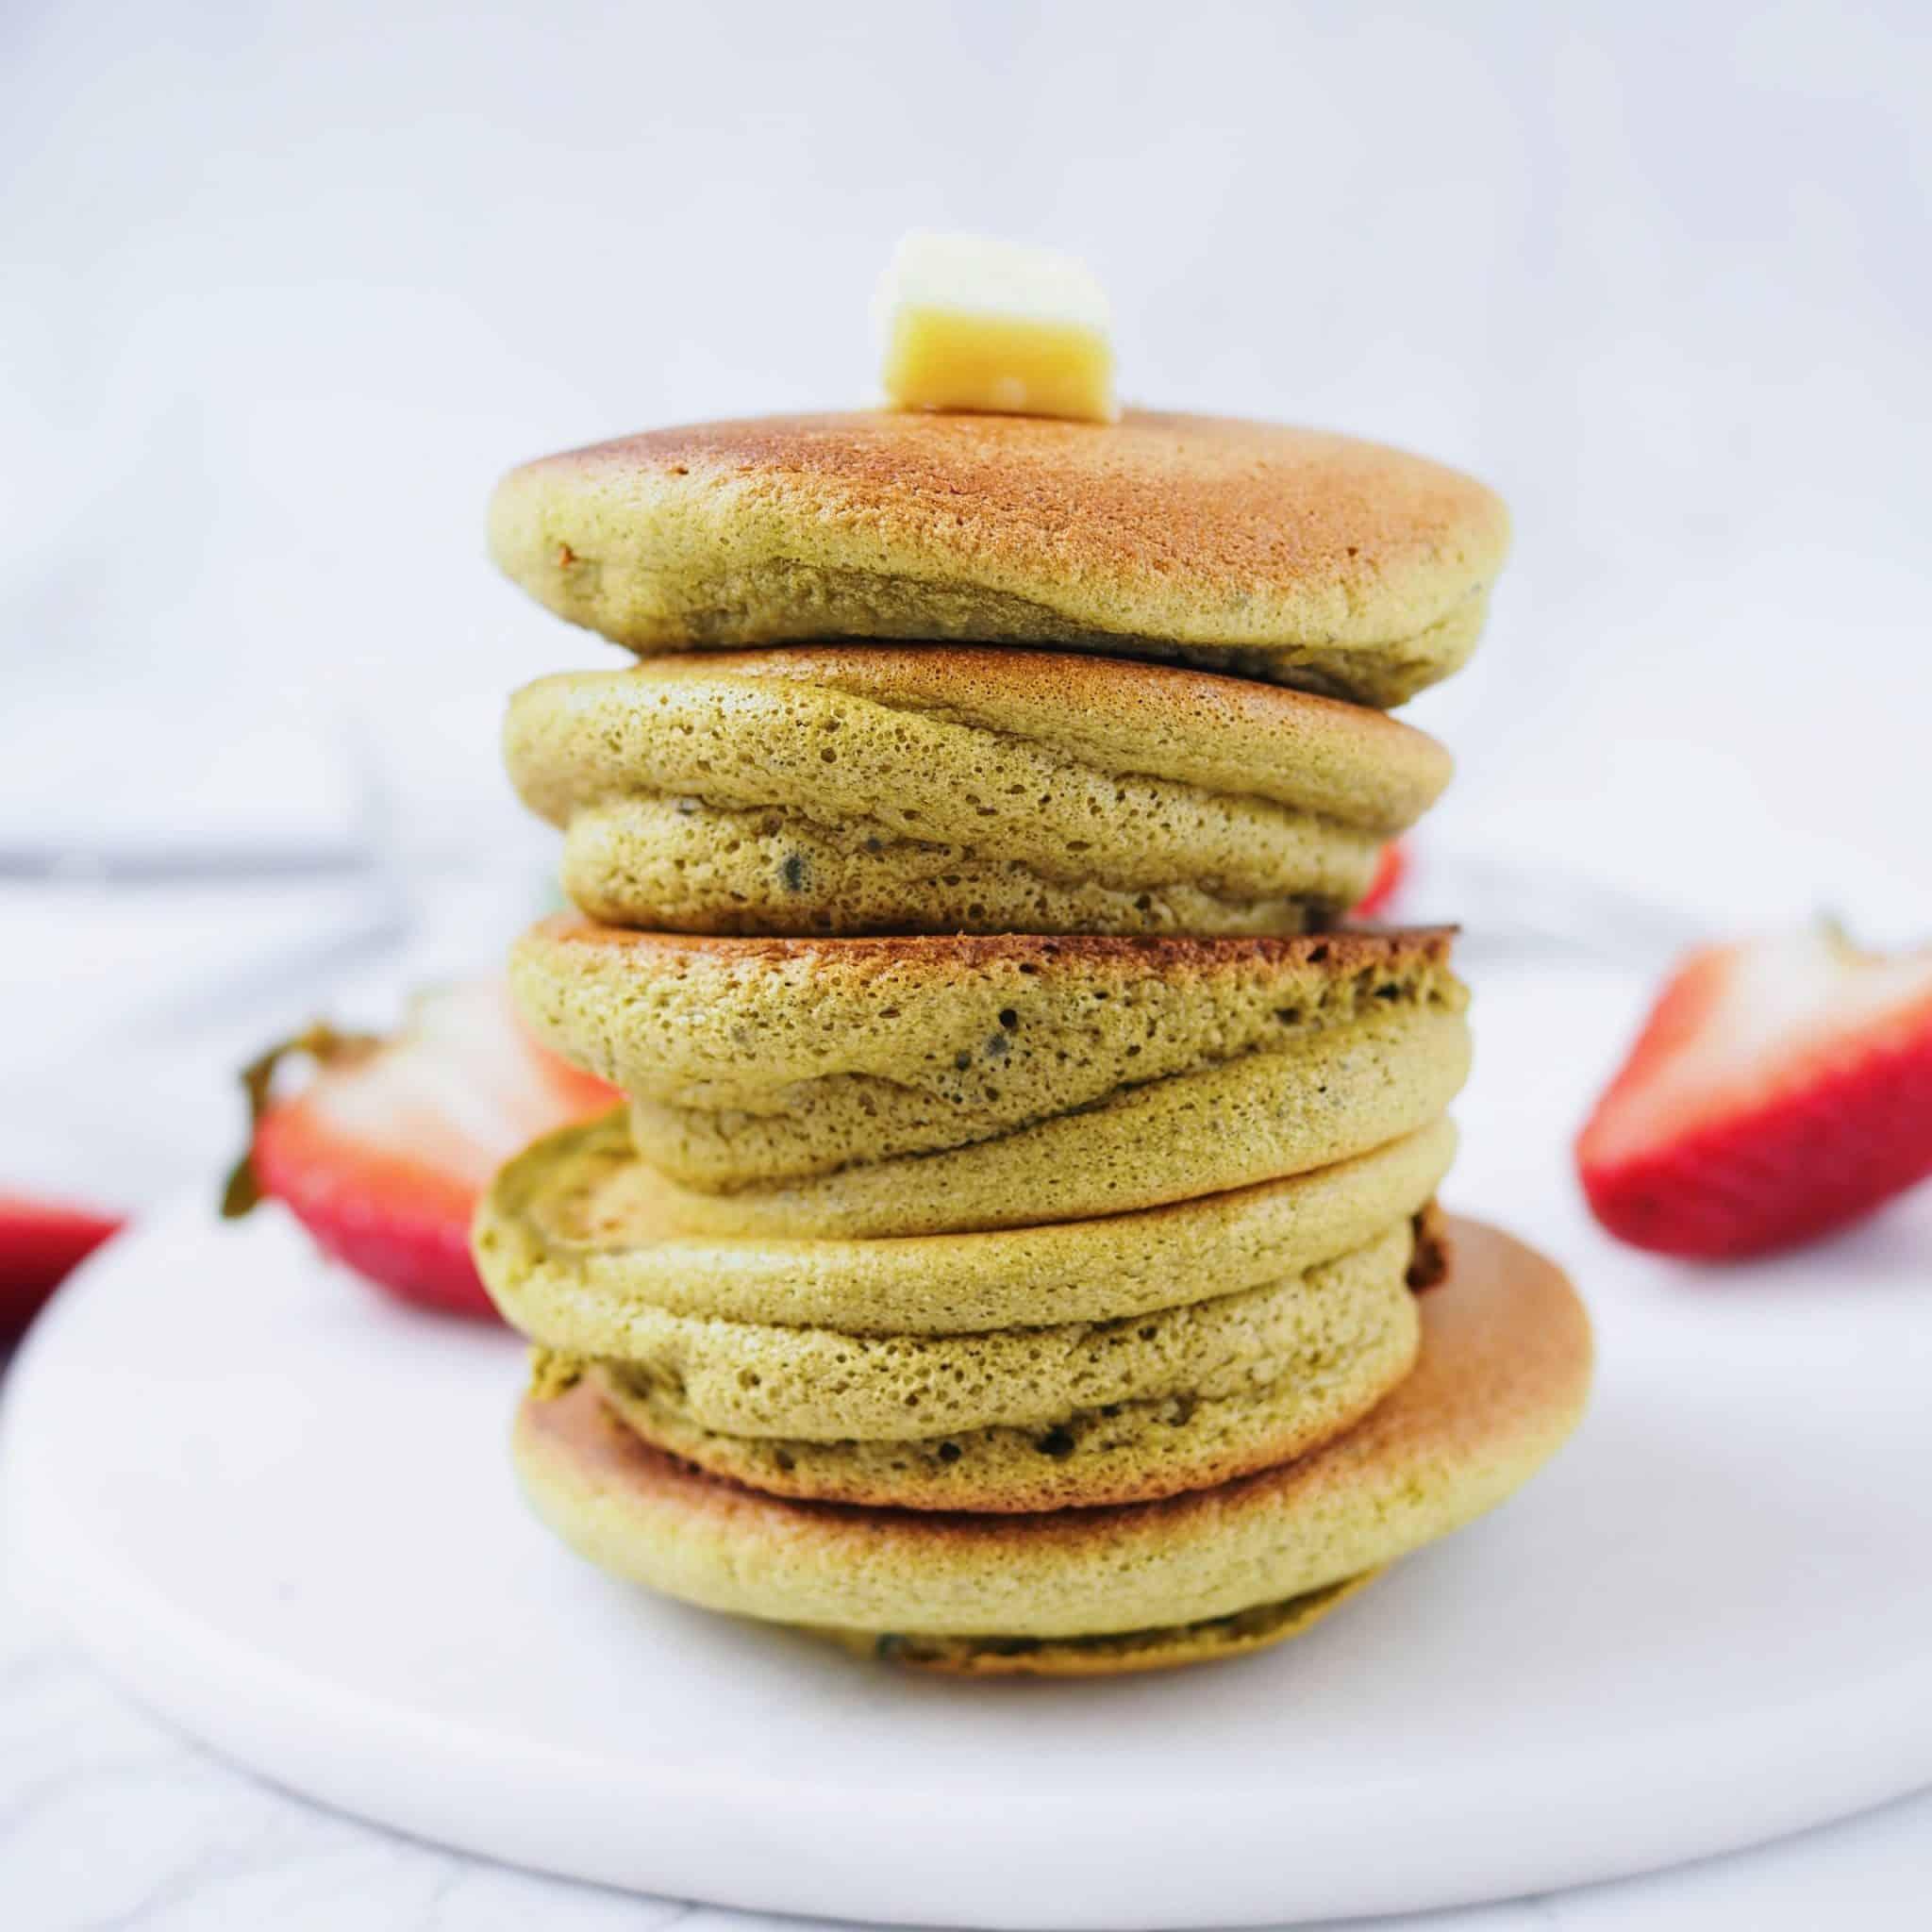 Japanese Matcha Soufflé Pancakes